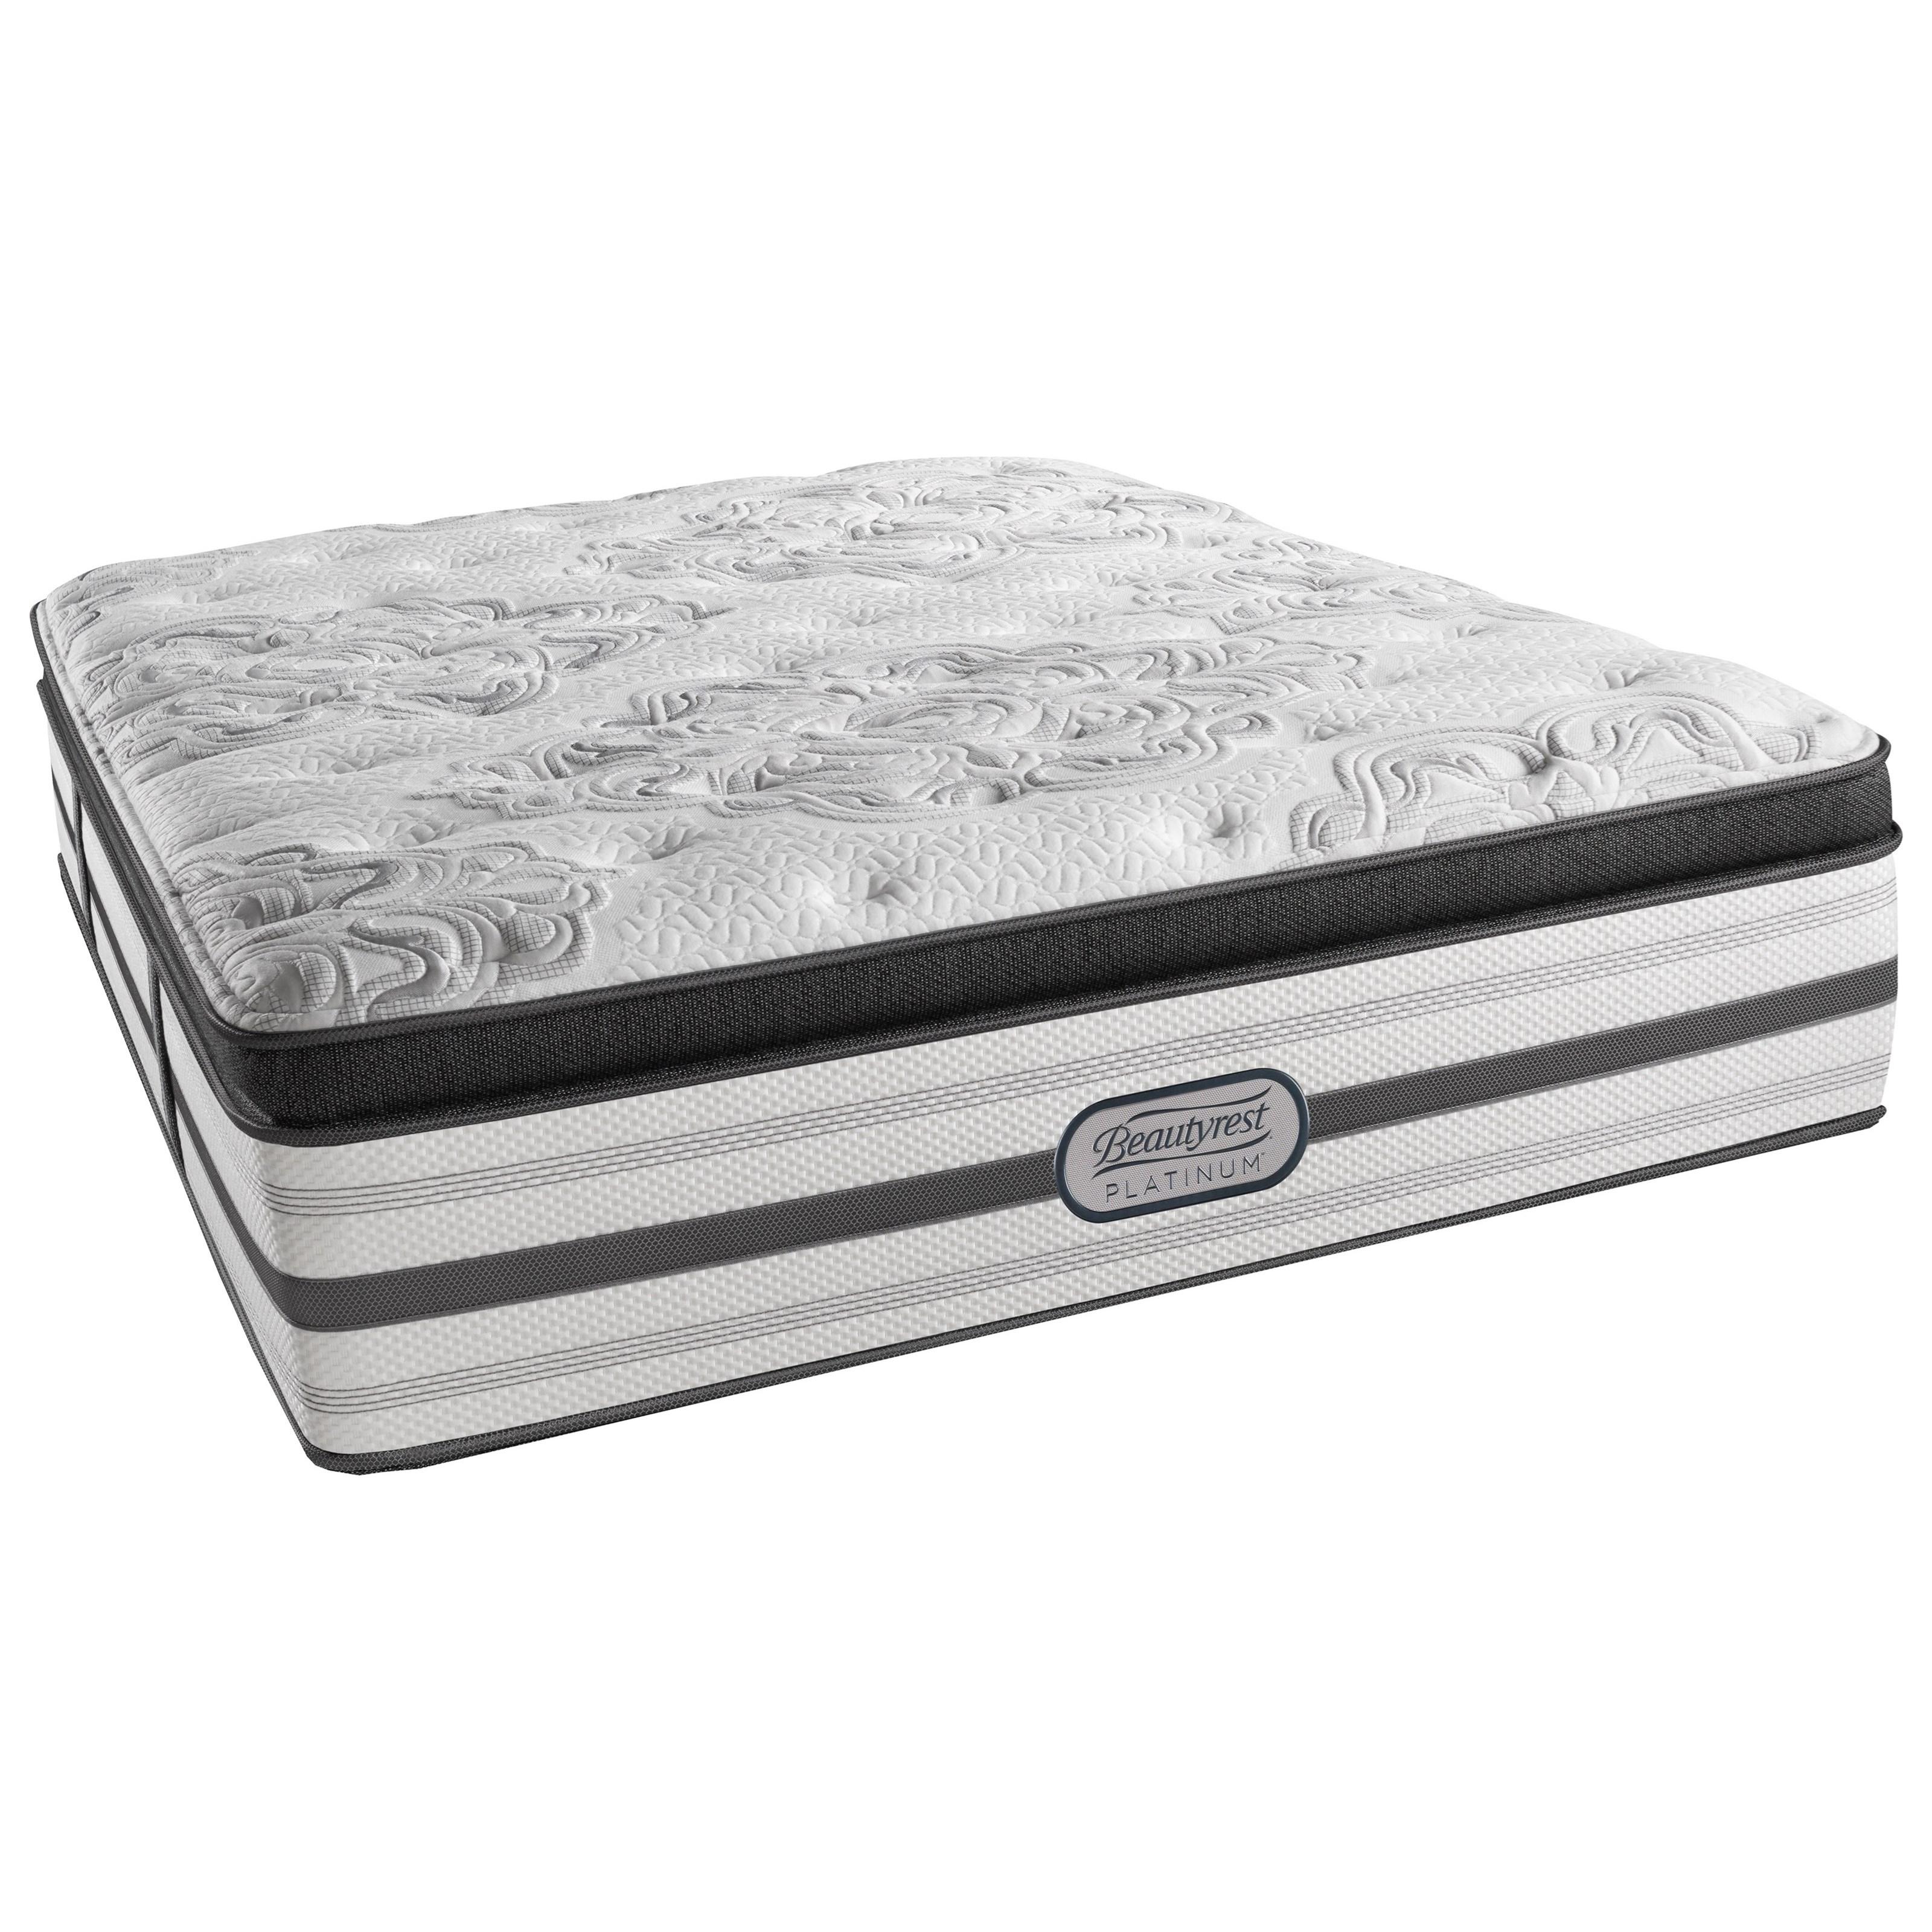 "Beautyrest Platinum Katherine King Luxury Firm Box PT 16 1/2"" Mattress - Item Number: LV4LFBT-K"